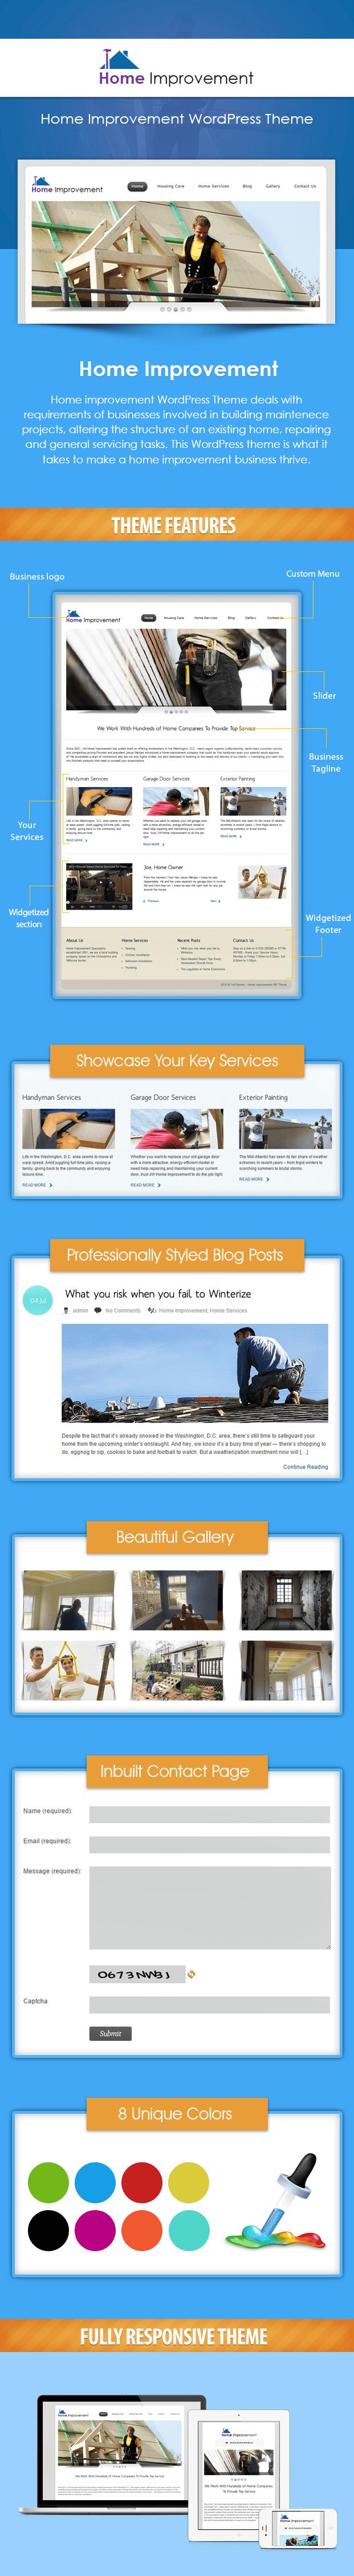 wordpress theme - home improvement, repair and renovation